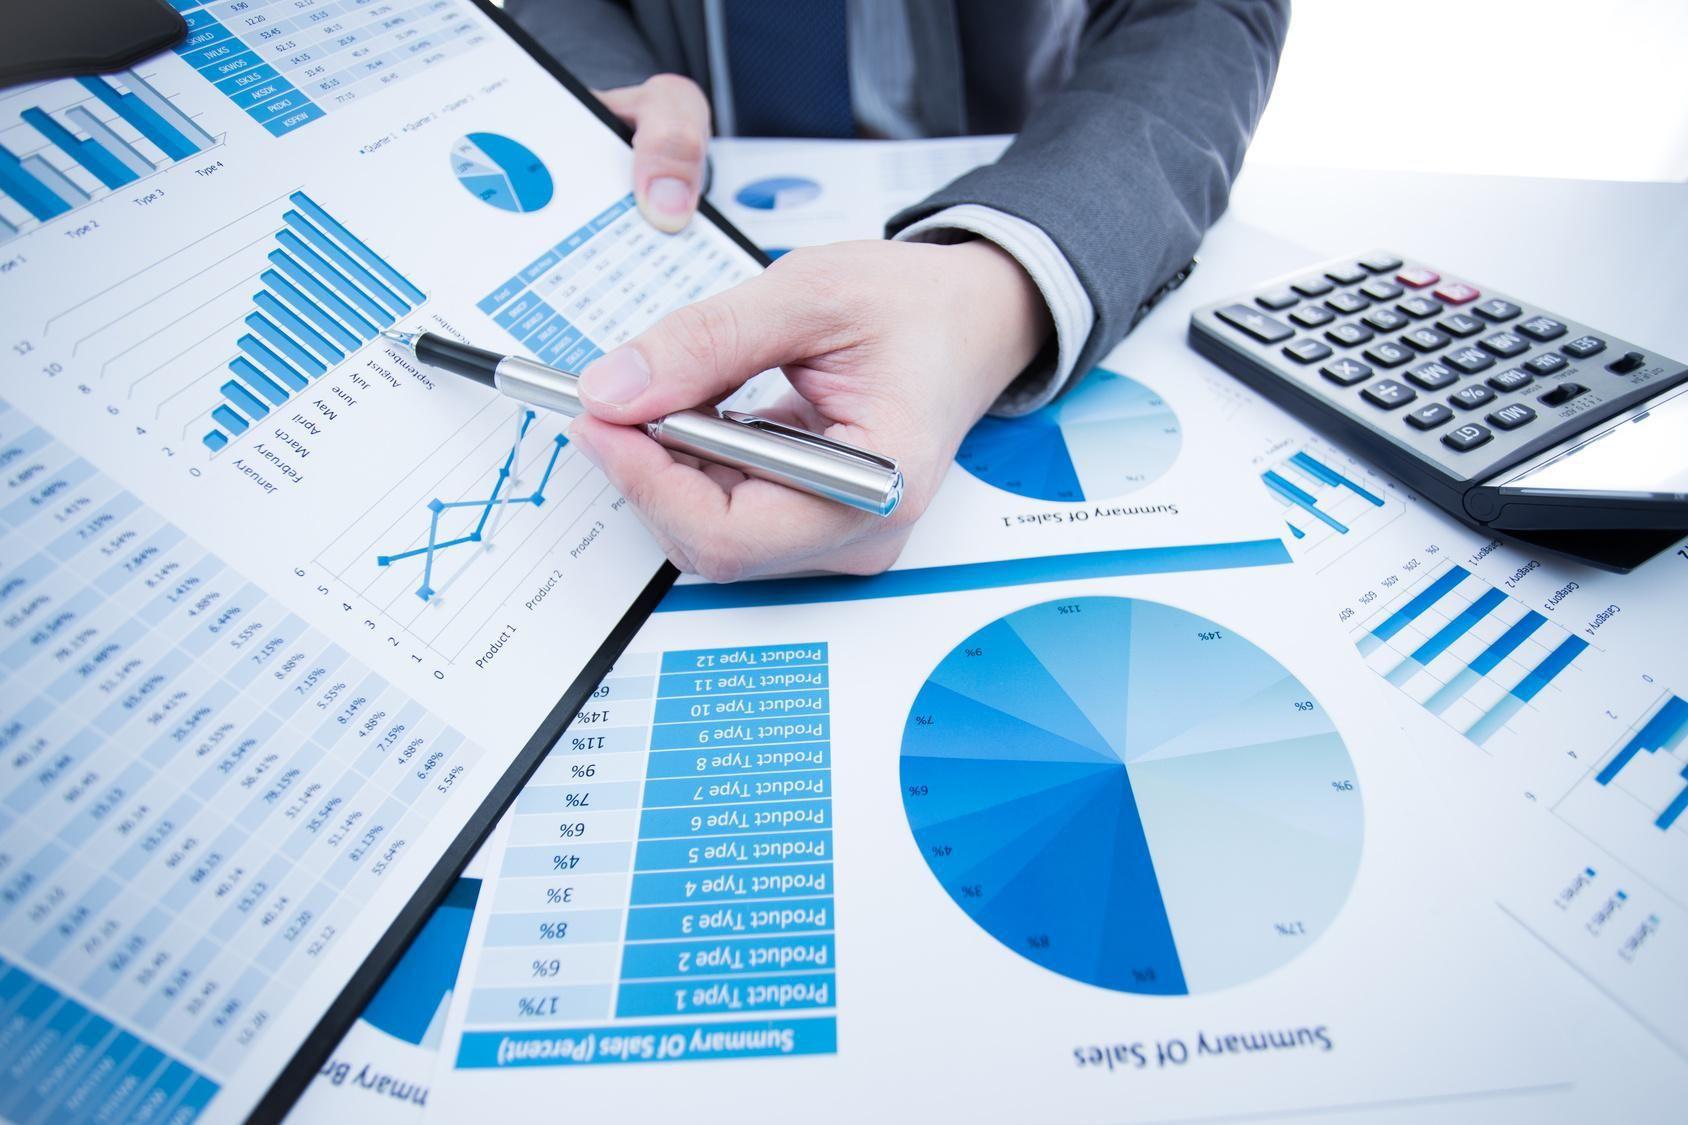 финансовый аналитик